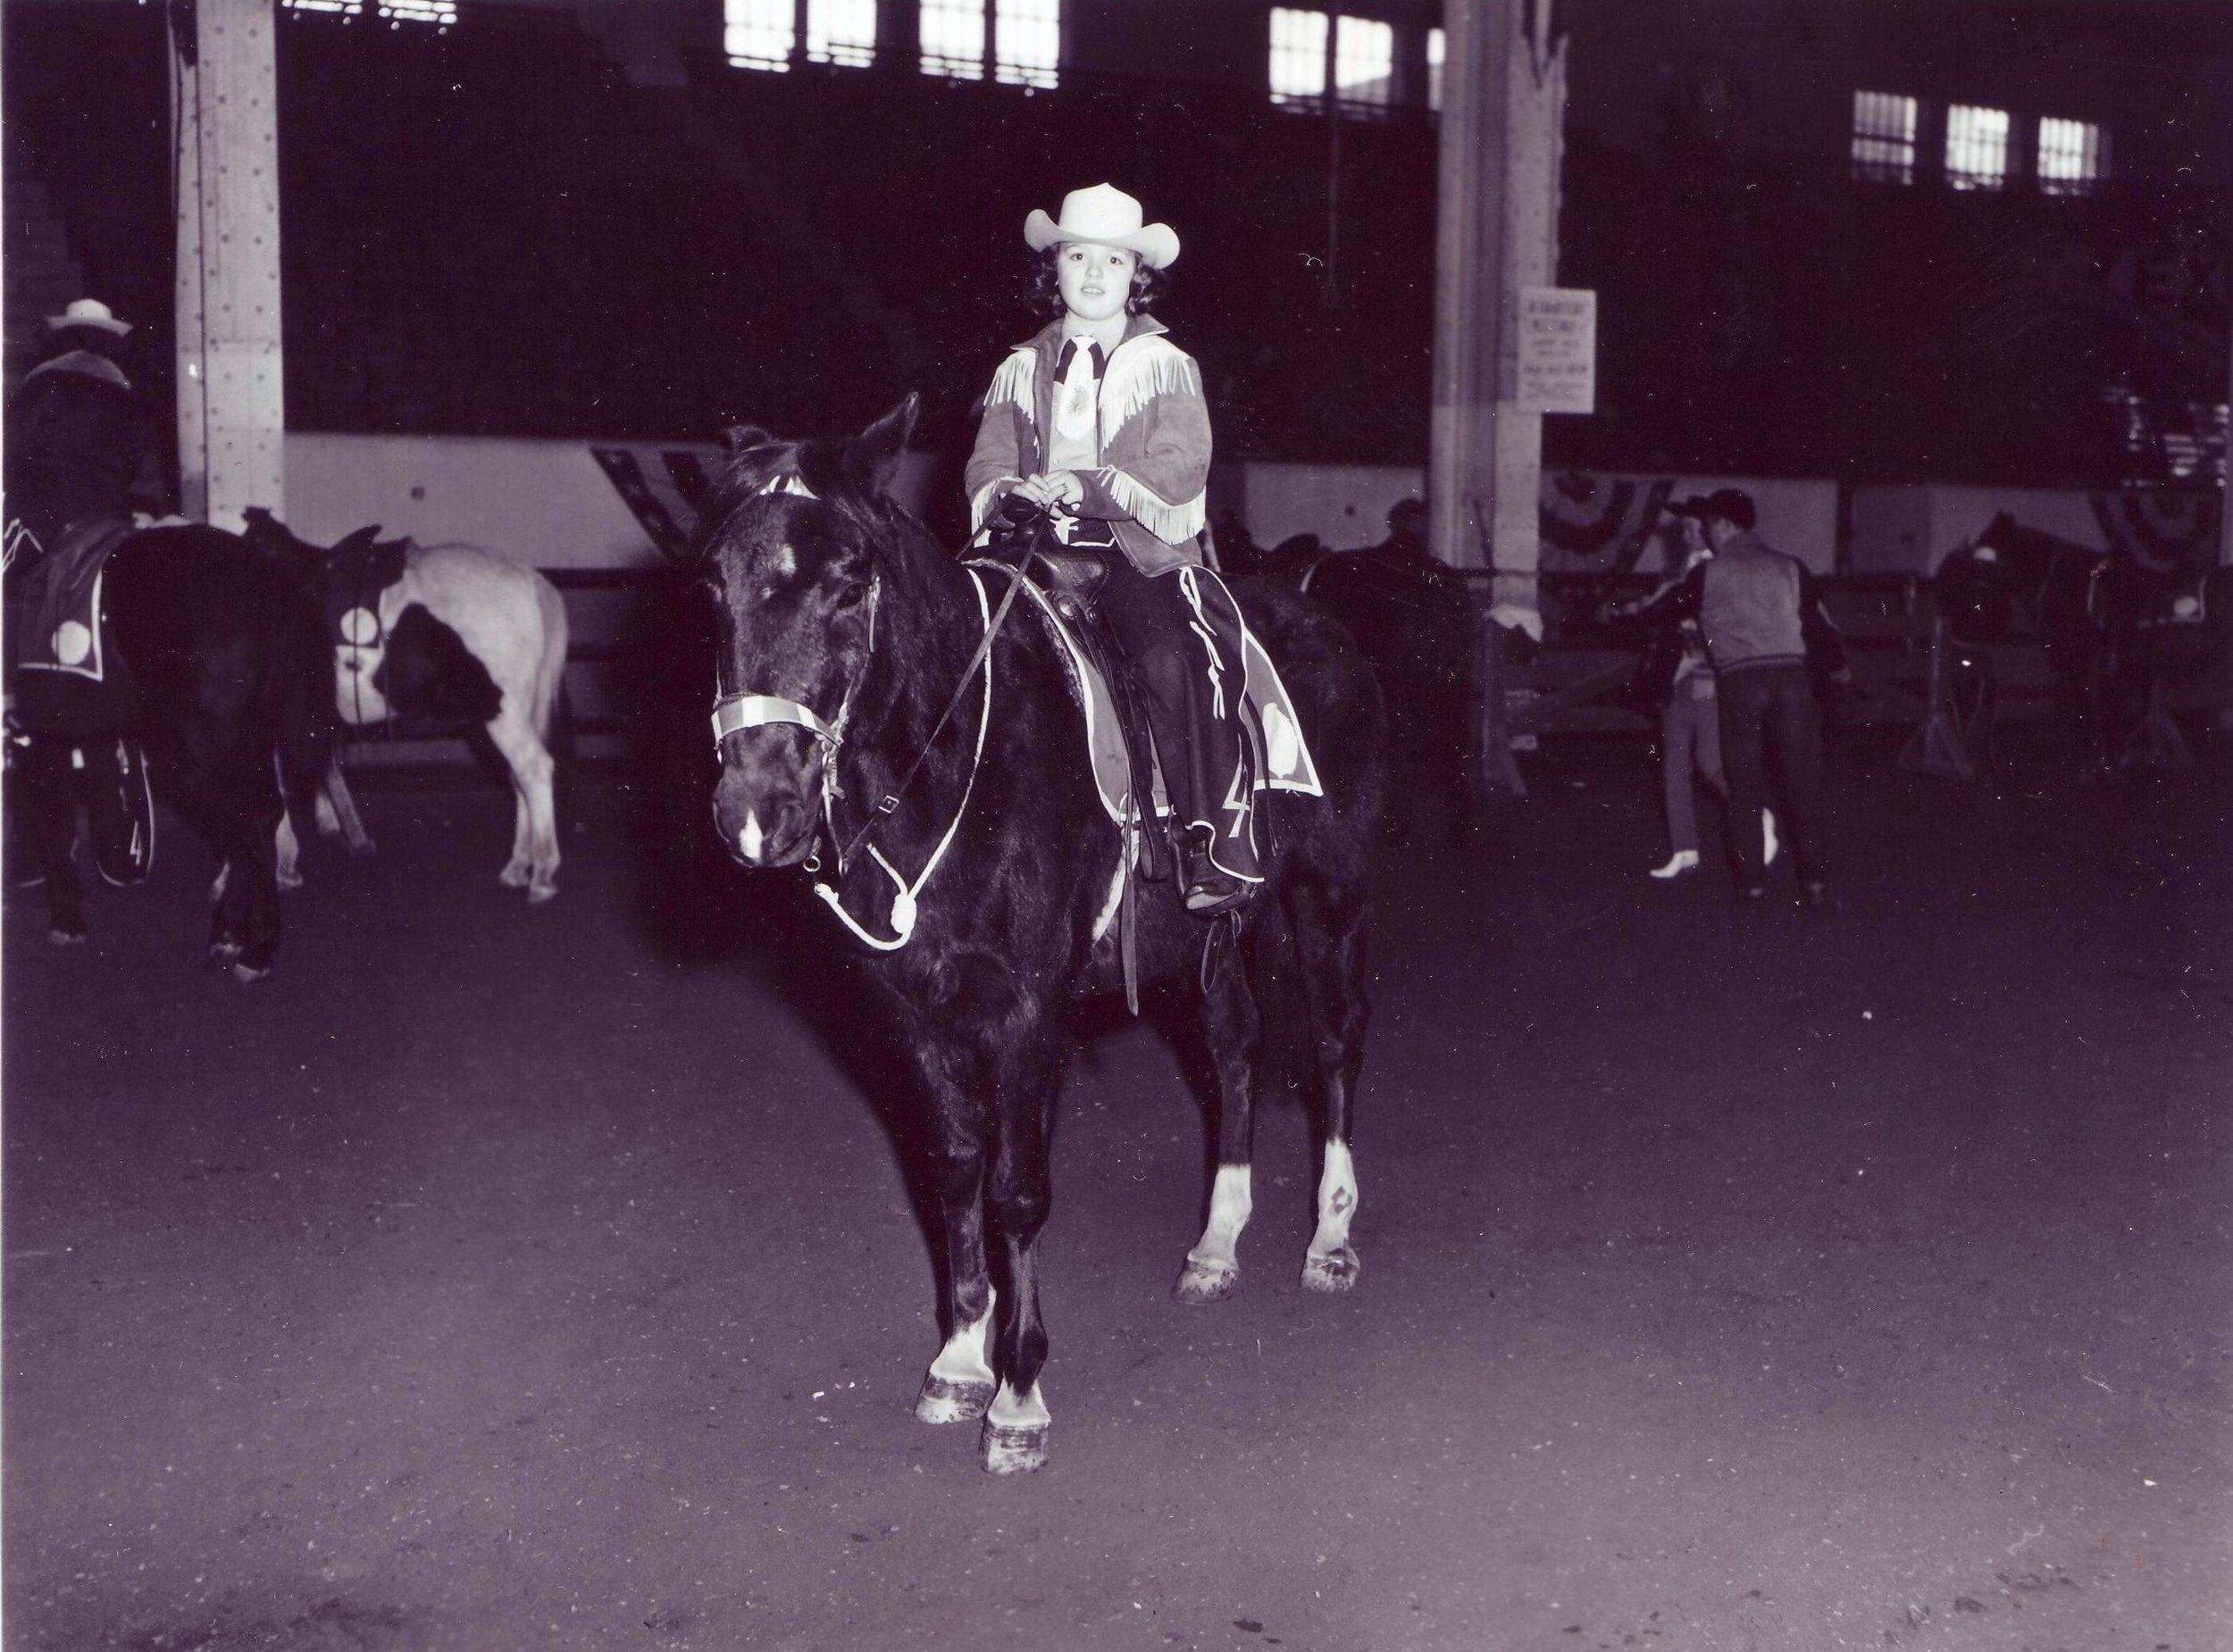 Carol Ann Akin warms up her horse in the Stockyard Stadium